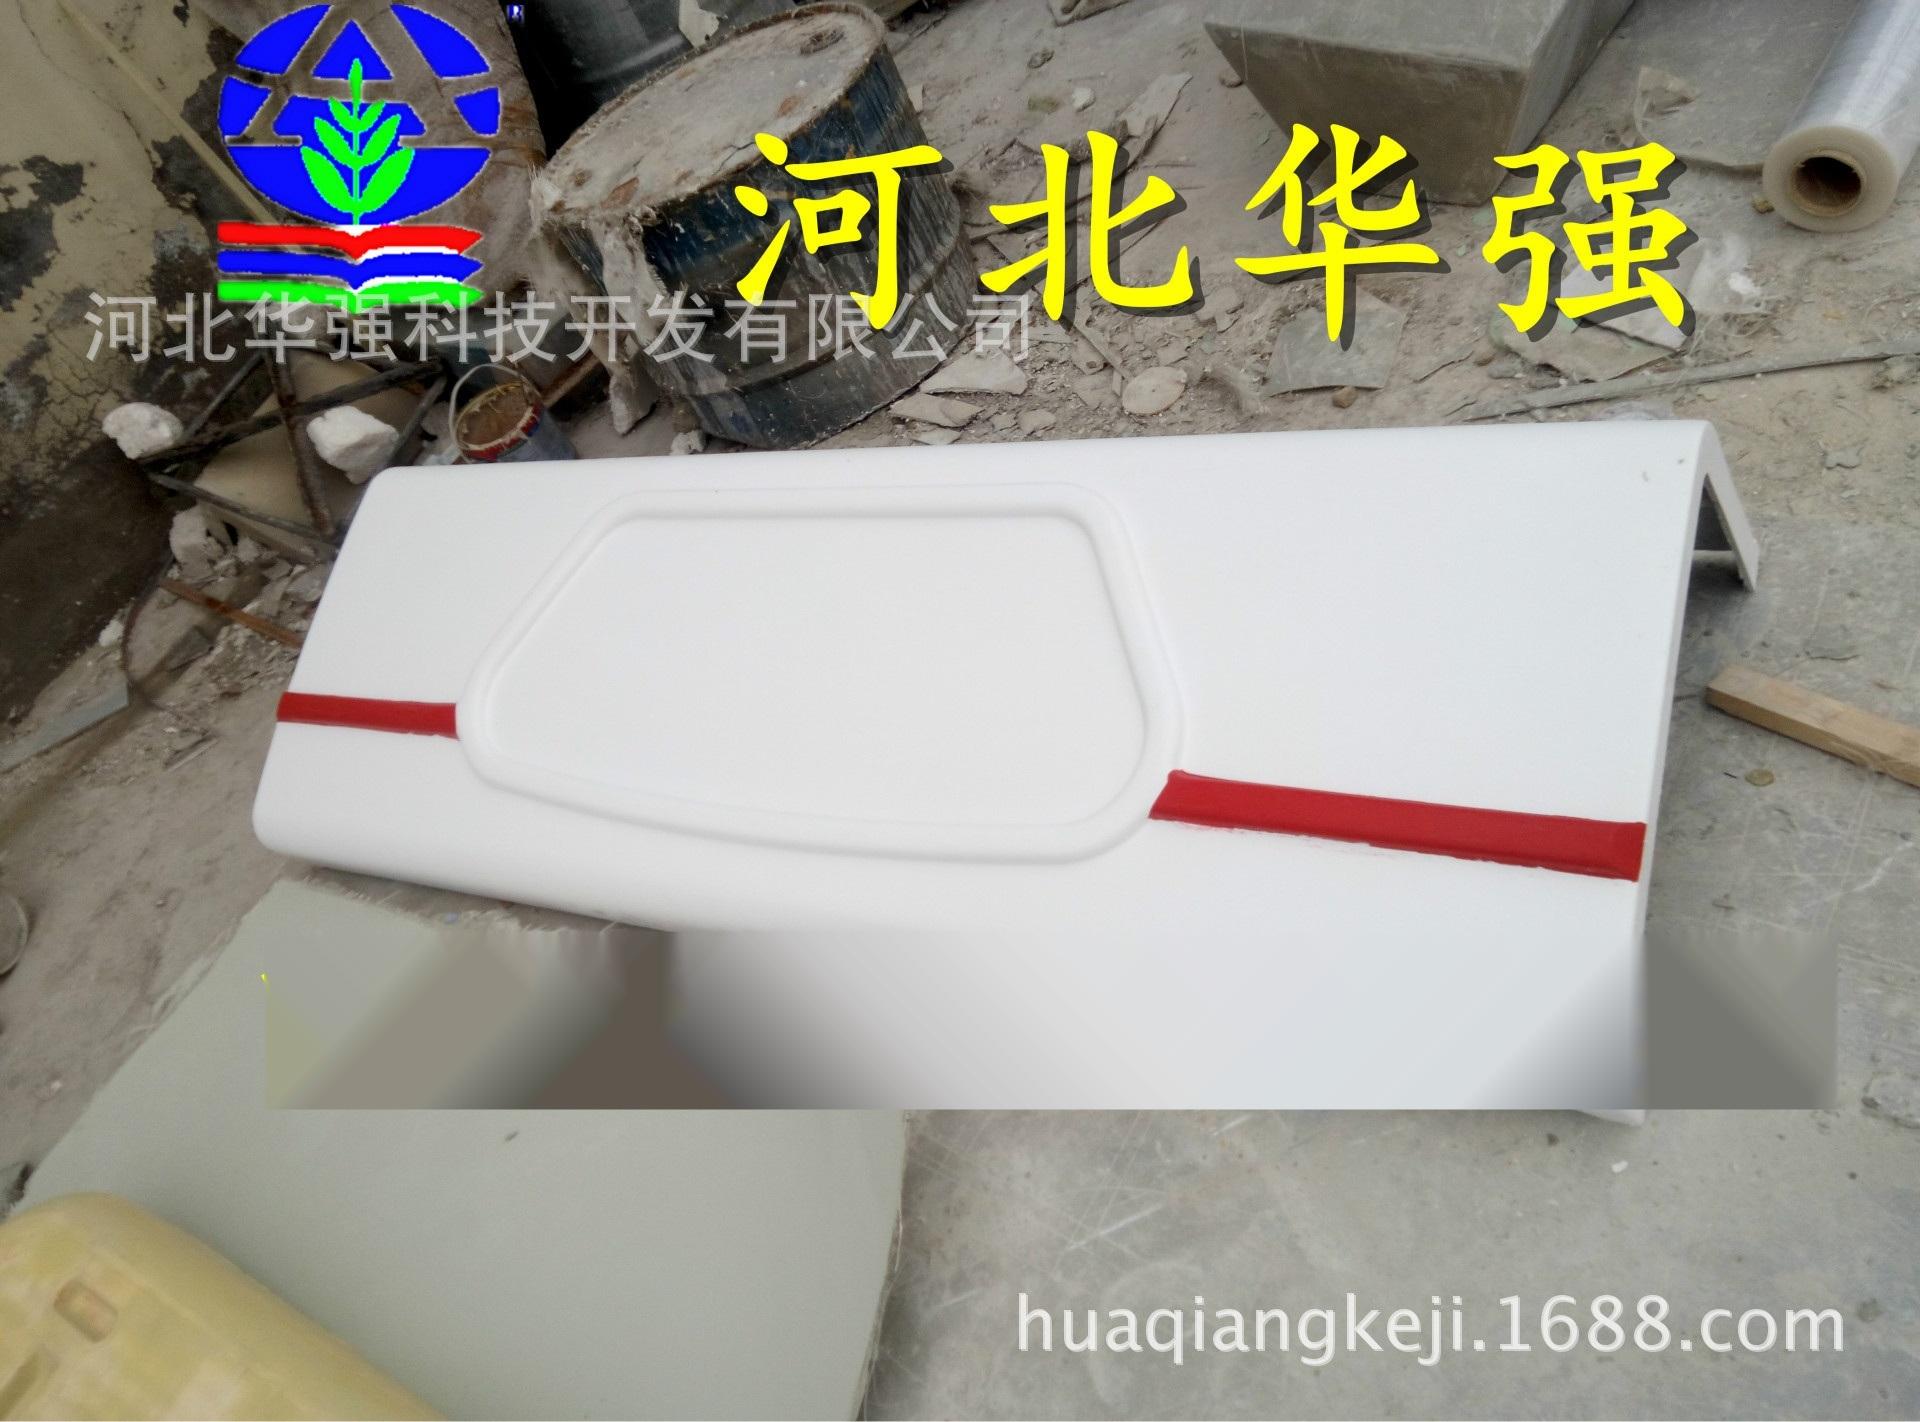 P61118-100338